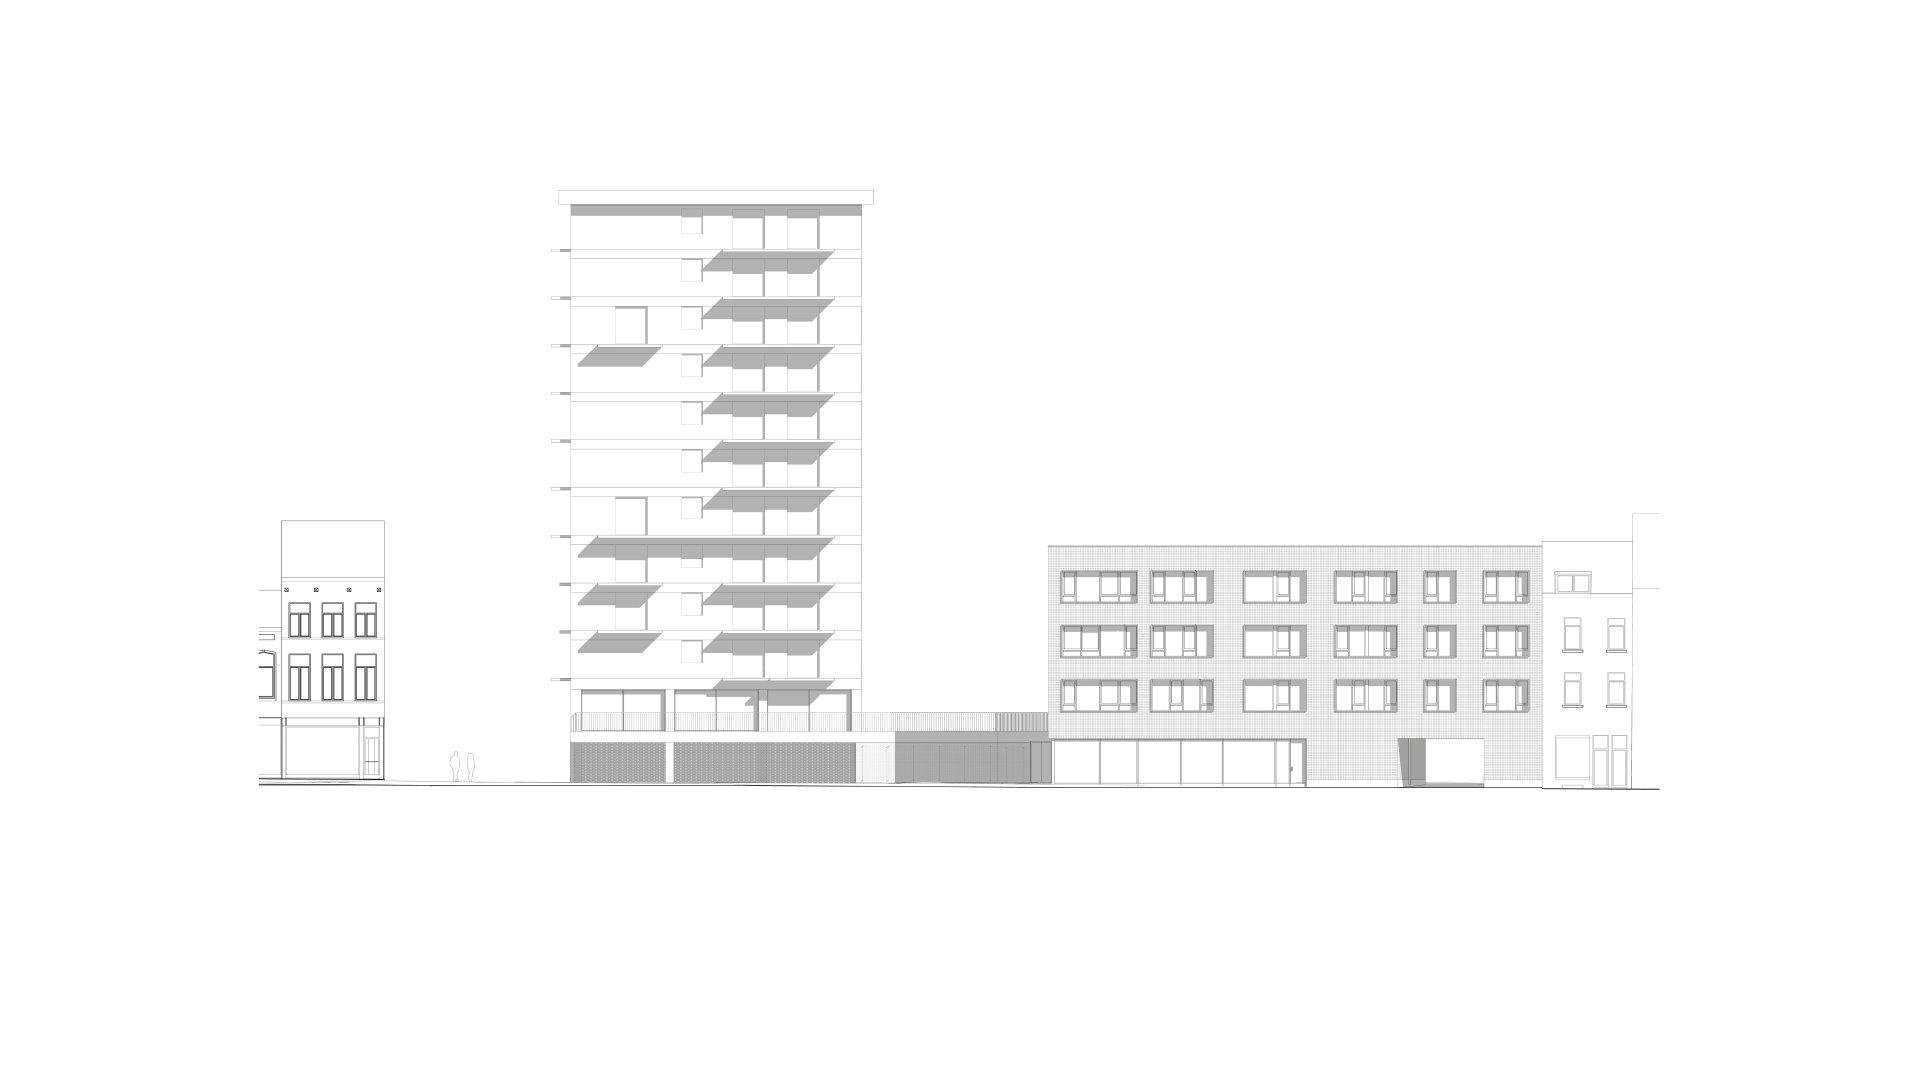 Rauter, plein, Anderlecht-1524194855